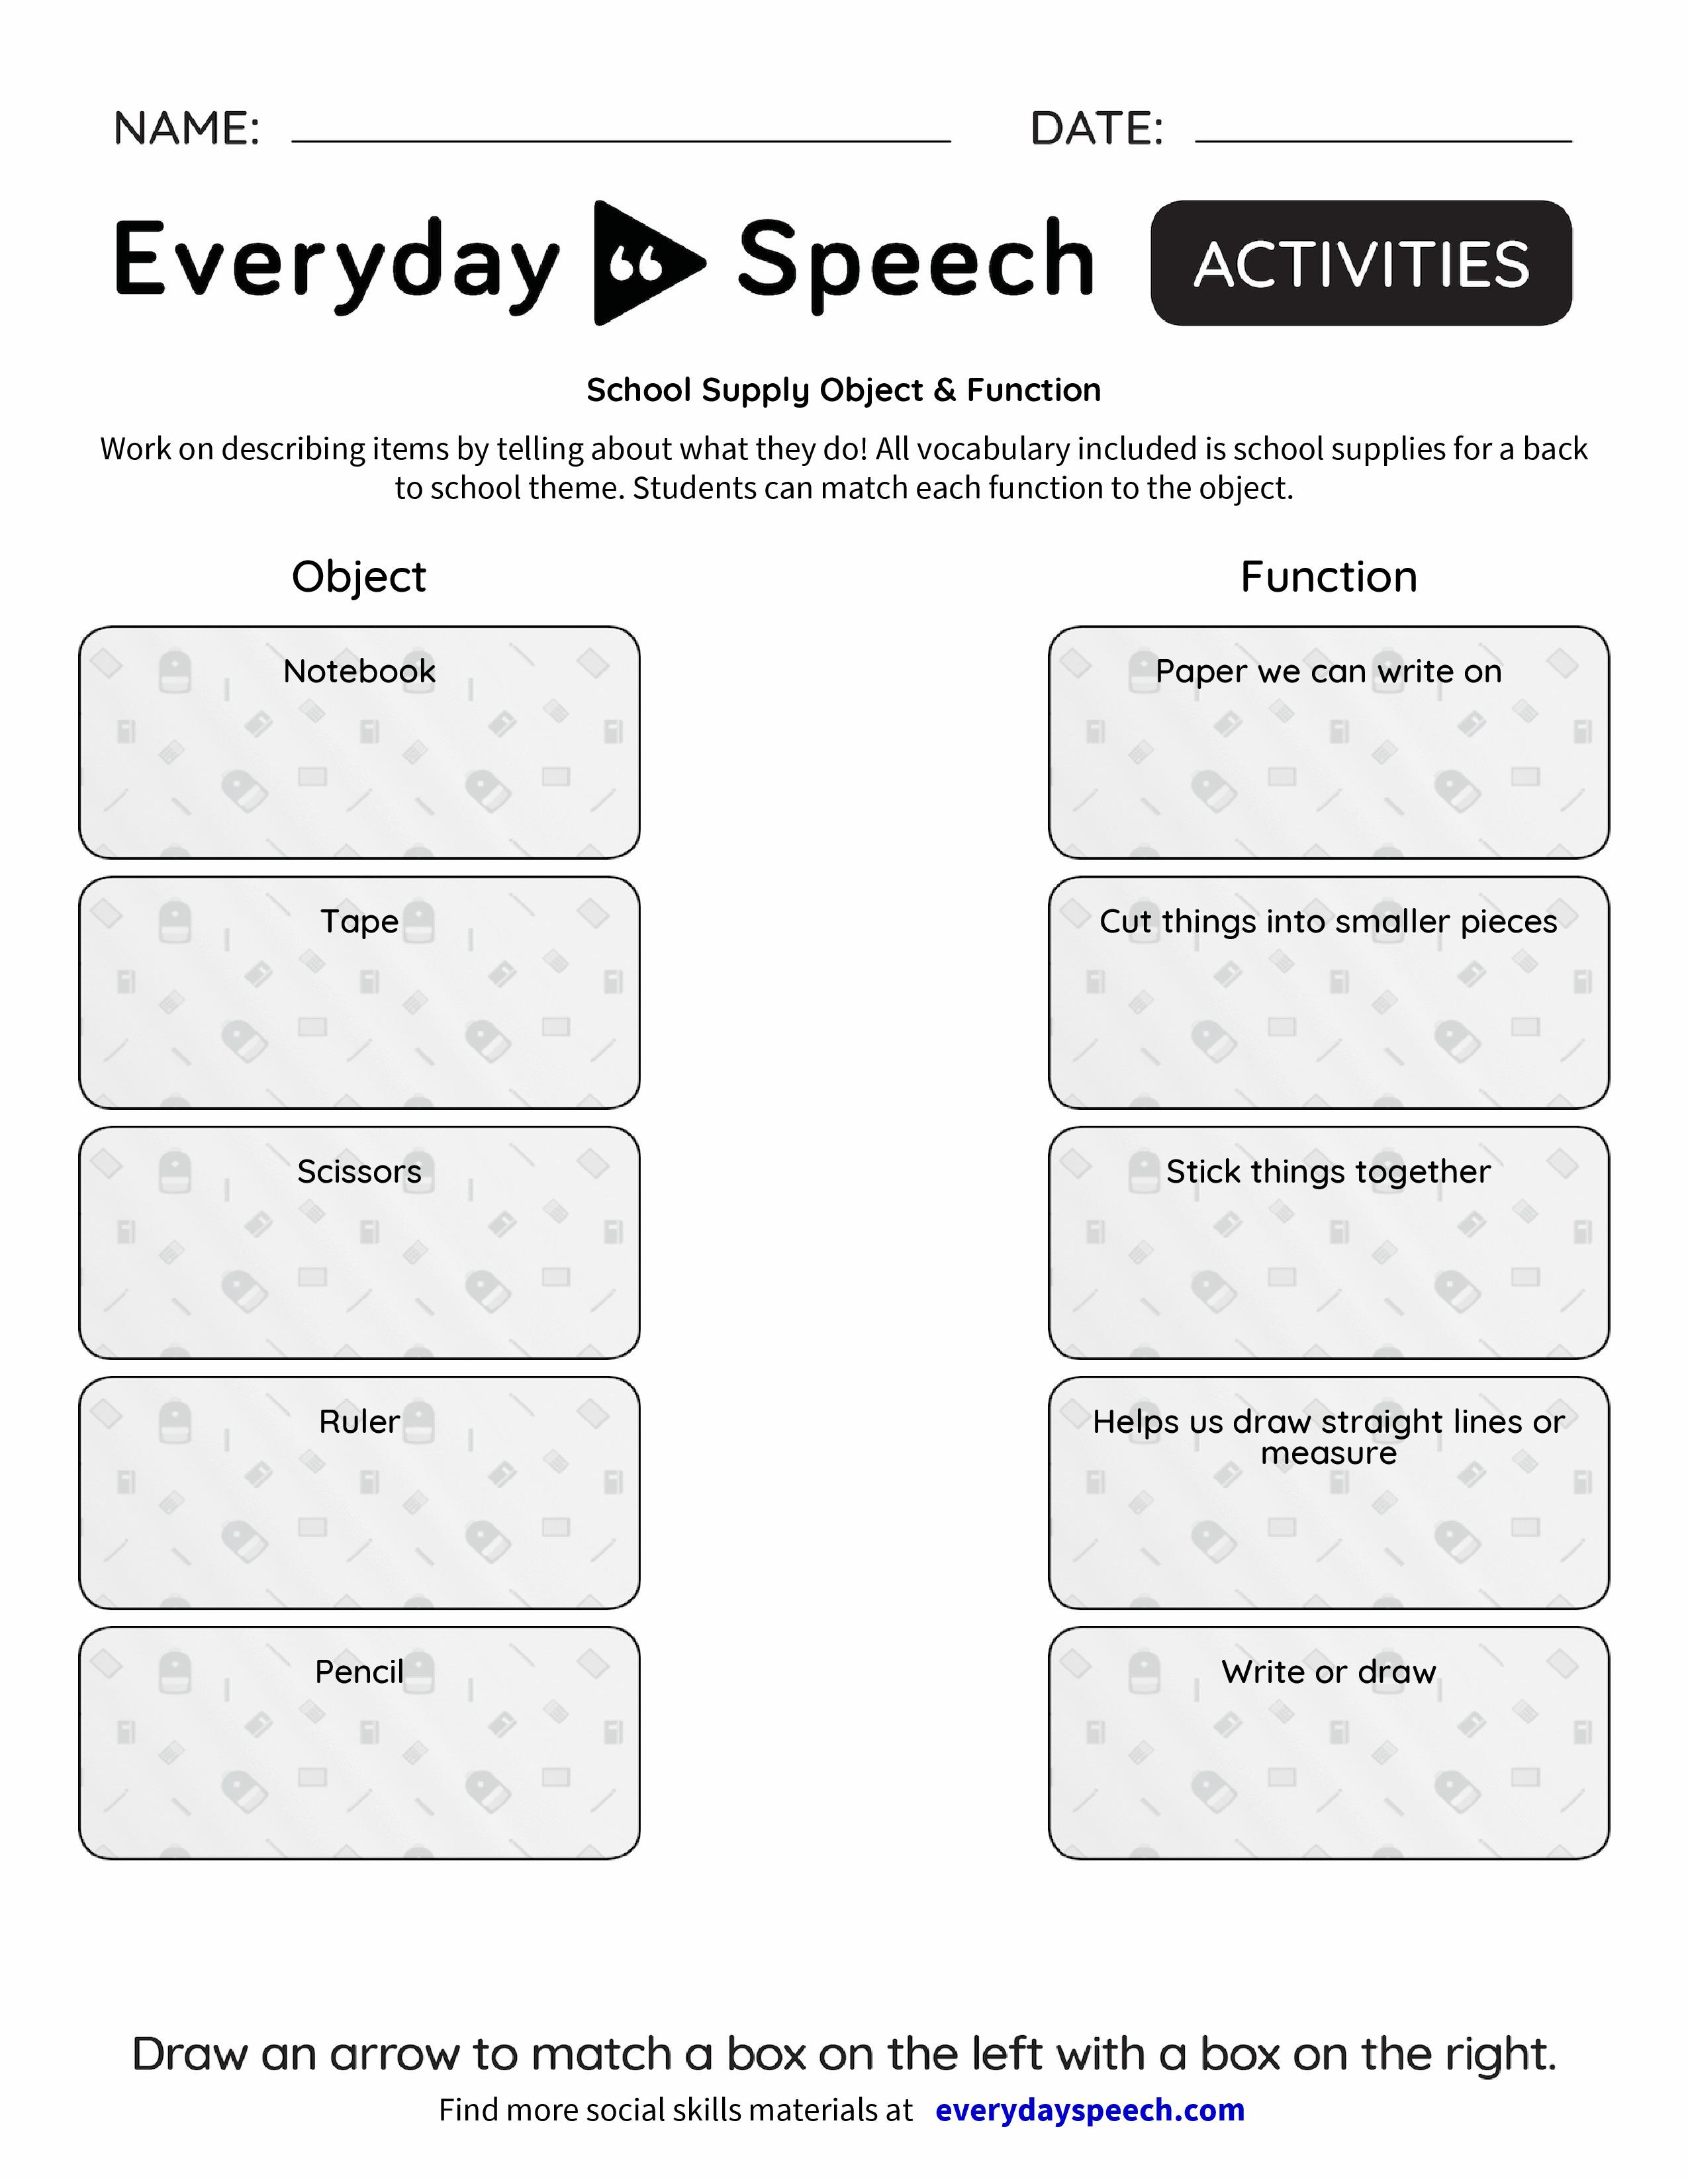 School Supply Object Functi Everyd Y Speech Everyd Y Speech